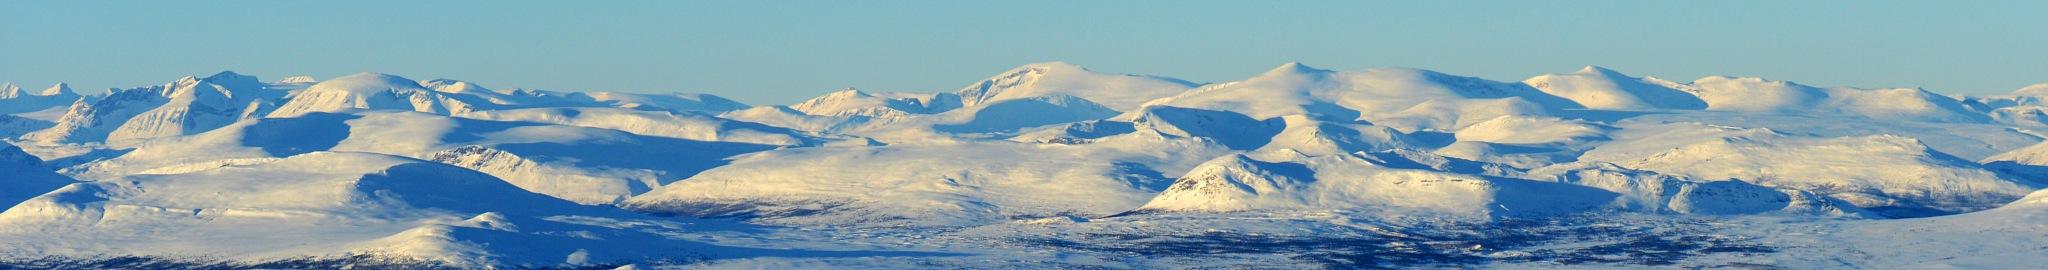 Jotunheimen, Norge by Lasse Tur